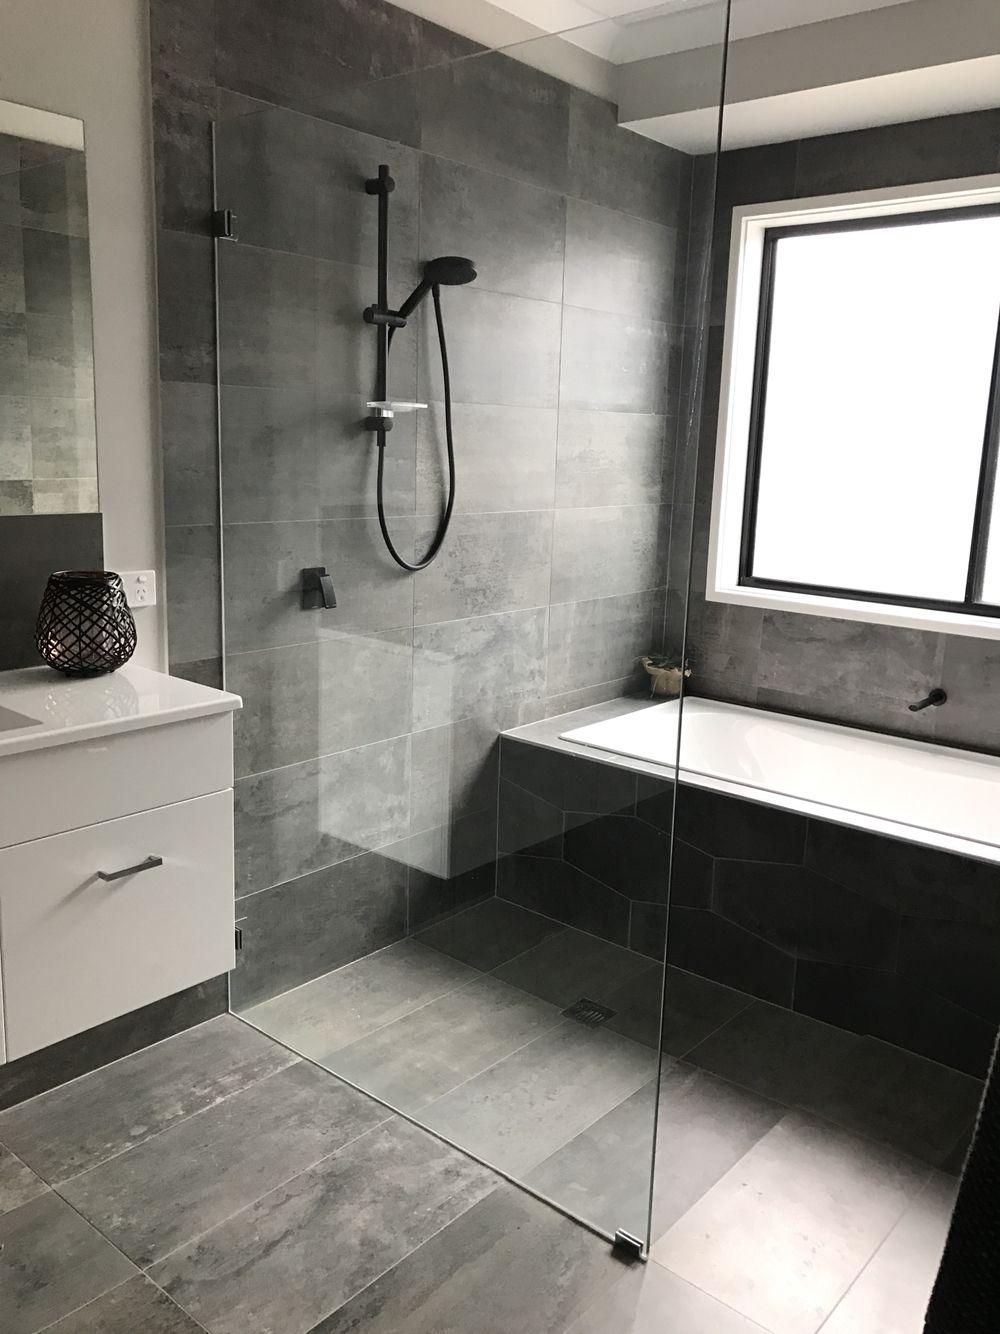 Modern Open Shower Plan Next To The Bath In The Main Bathroom Featuring Phoenix Vivid Shower Head Phoenix Tap And Open Showers Open Plan Bathrooms Bathroom